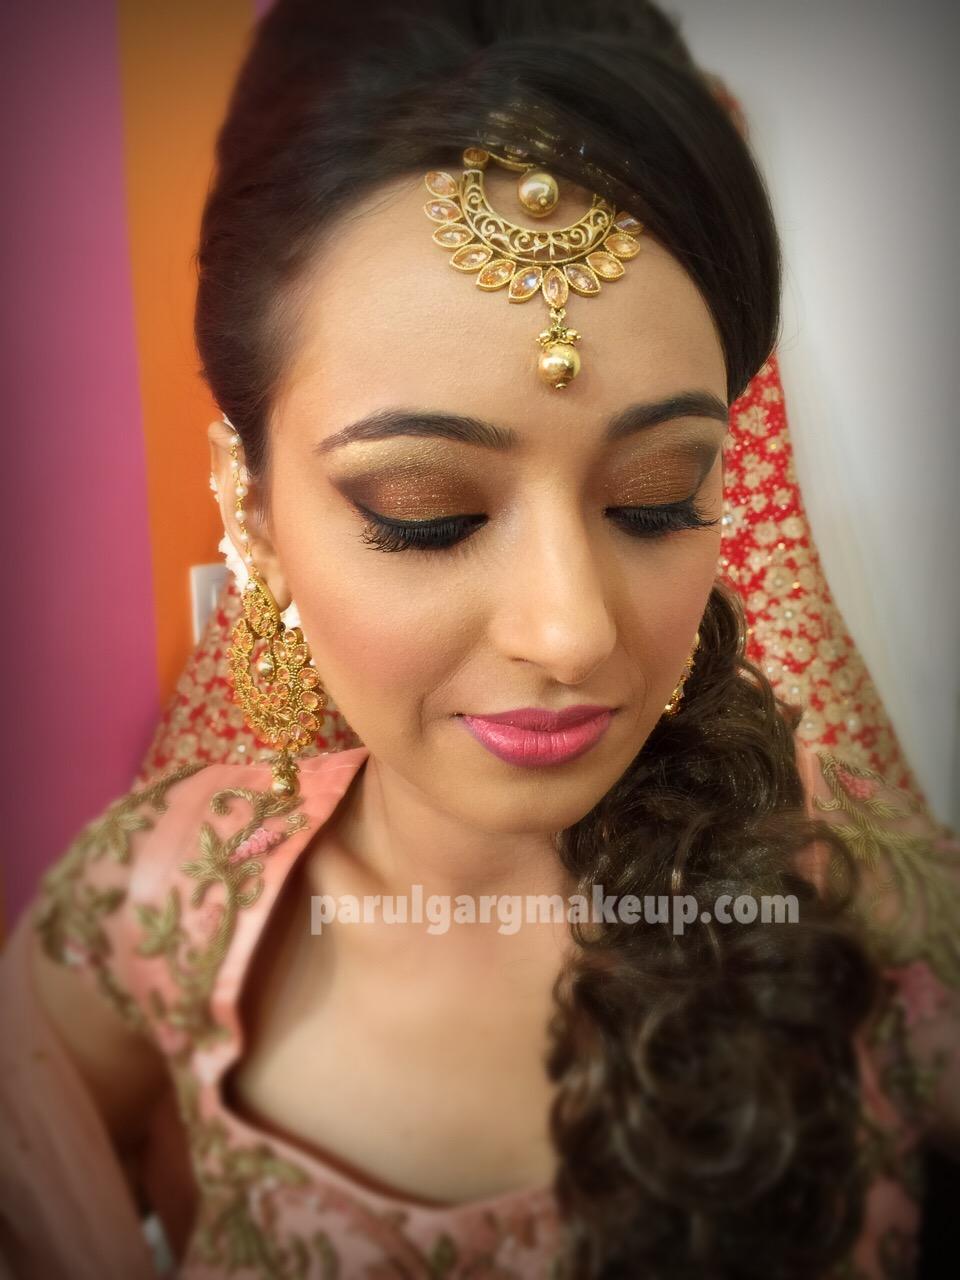 Engagement Makeup by Parul Garg